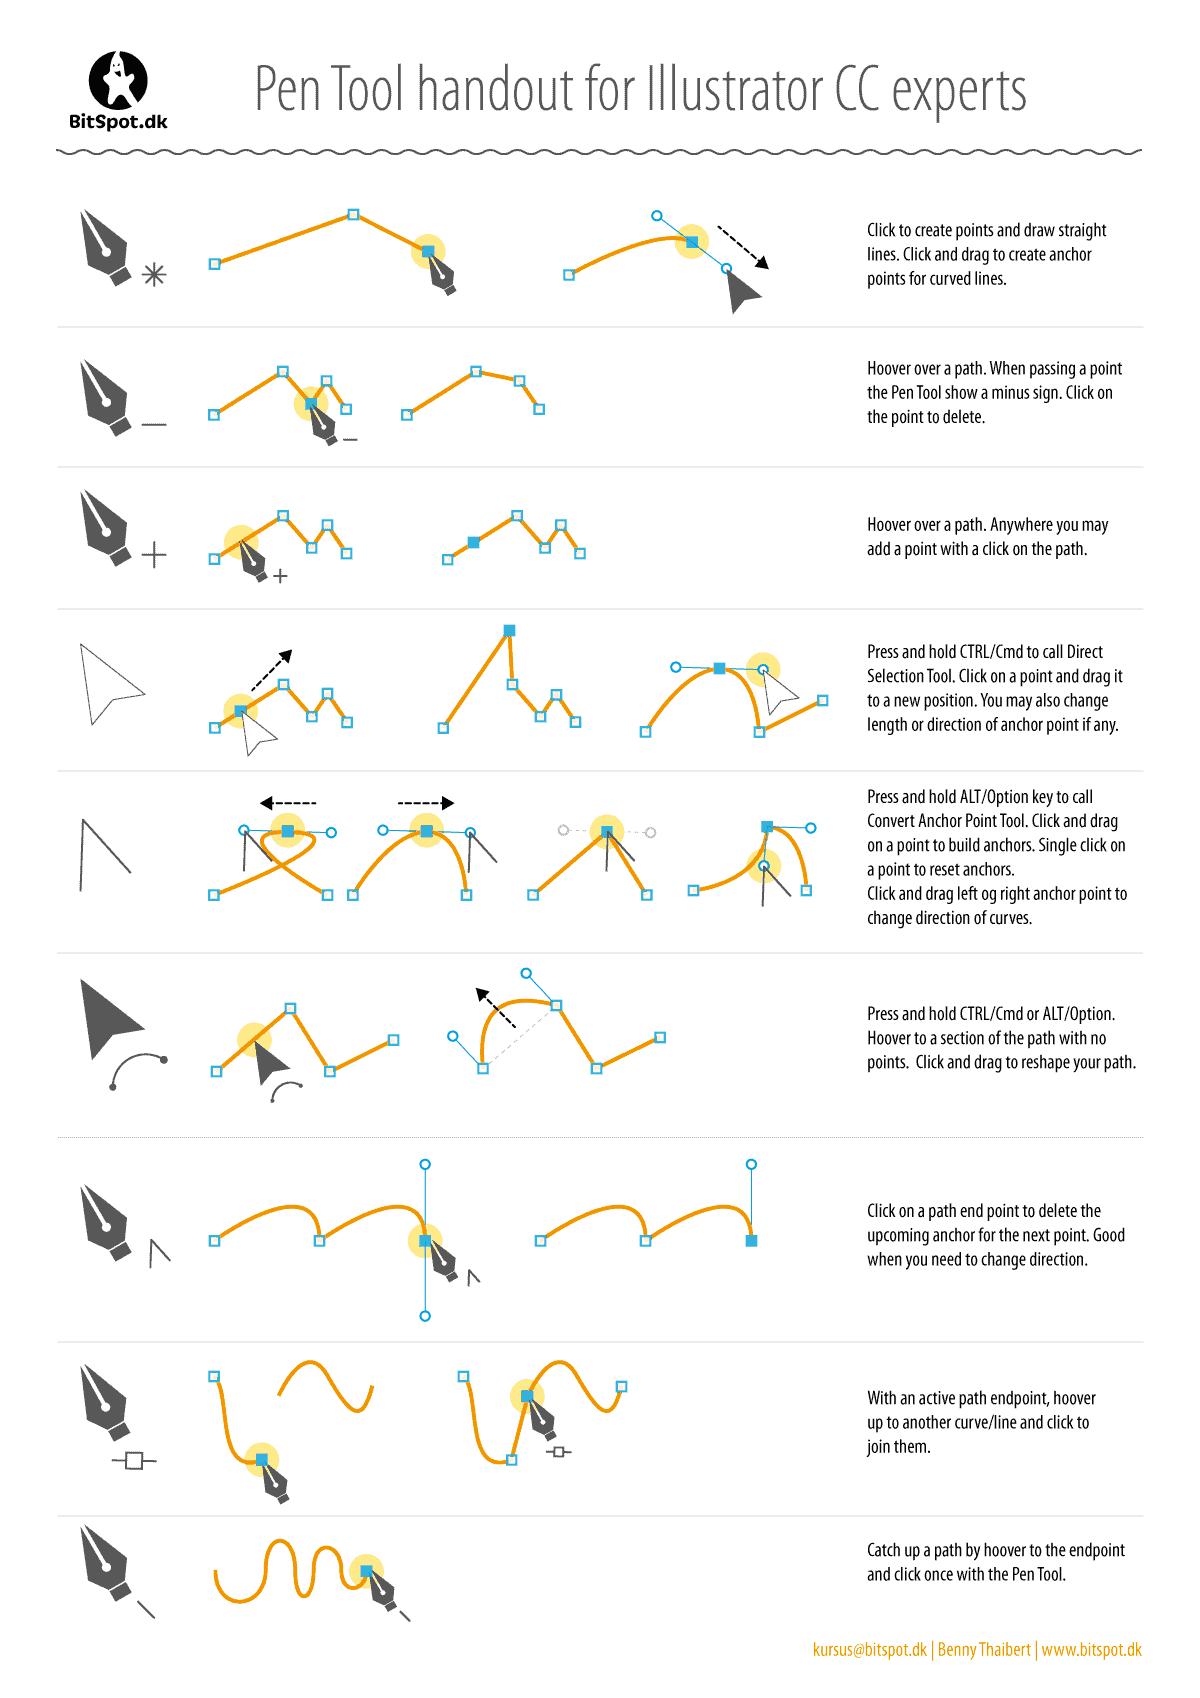 Pen Tool Functions